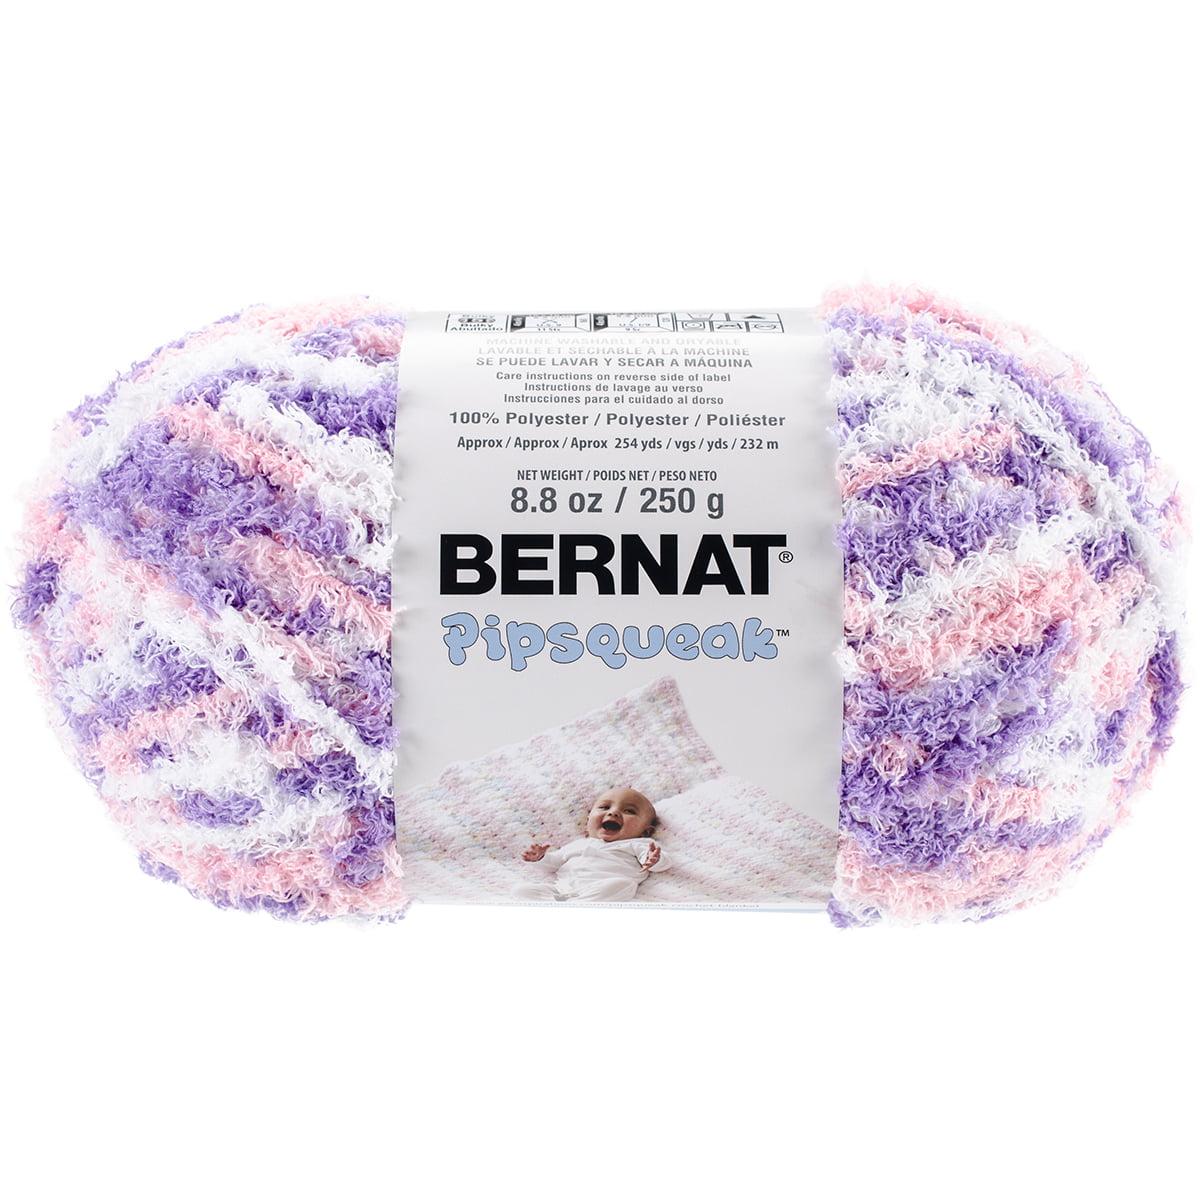 Blue Jean Swirl Super soft-250g8.8oz Bernat Pipsqueak Stripes